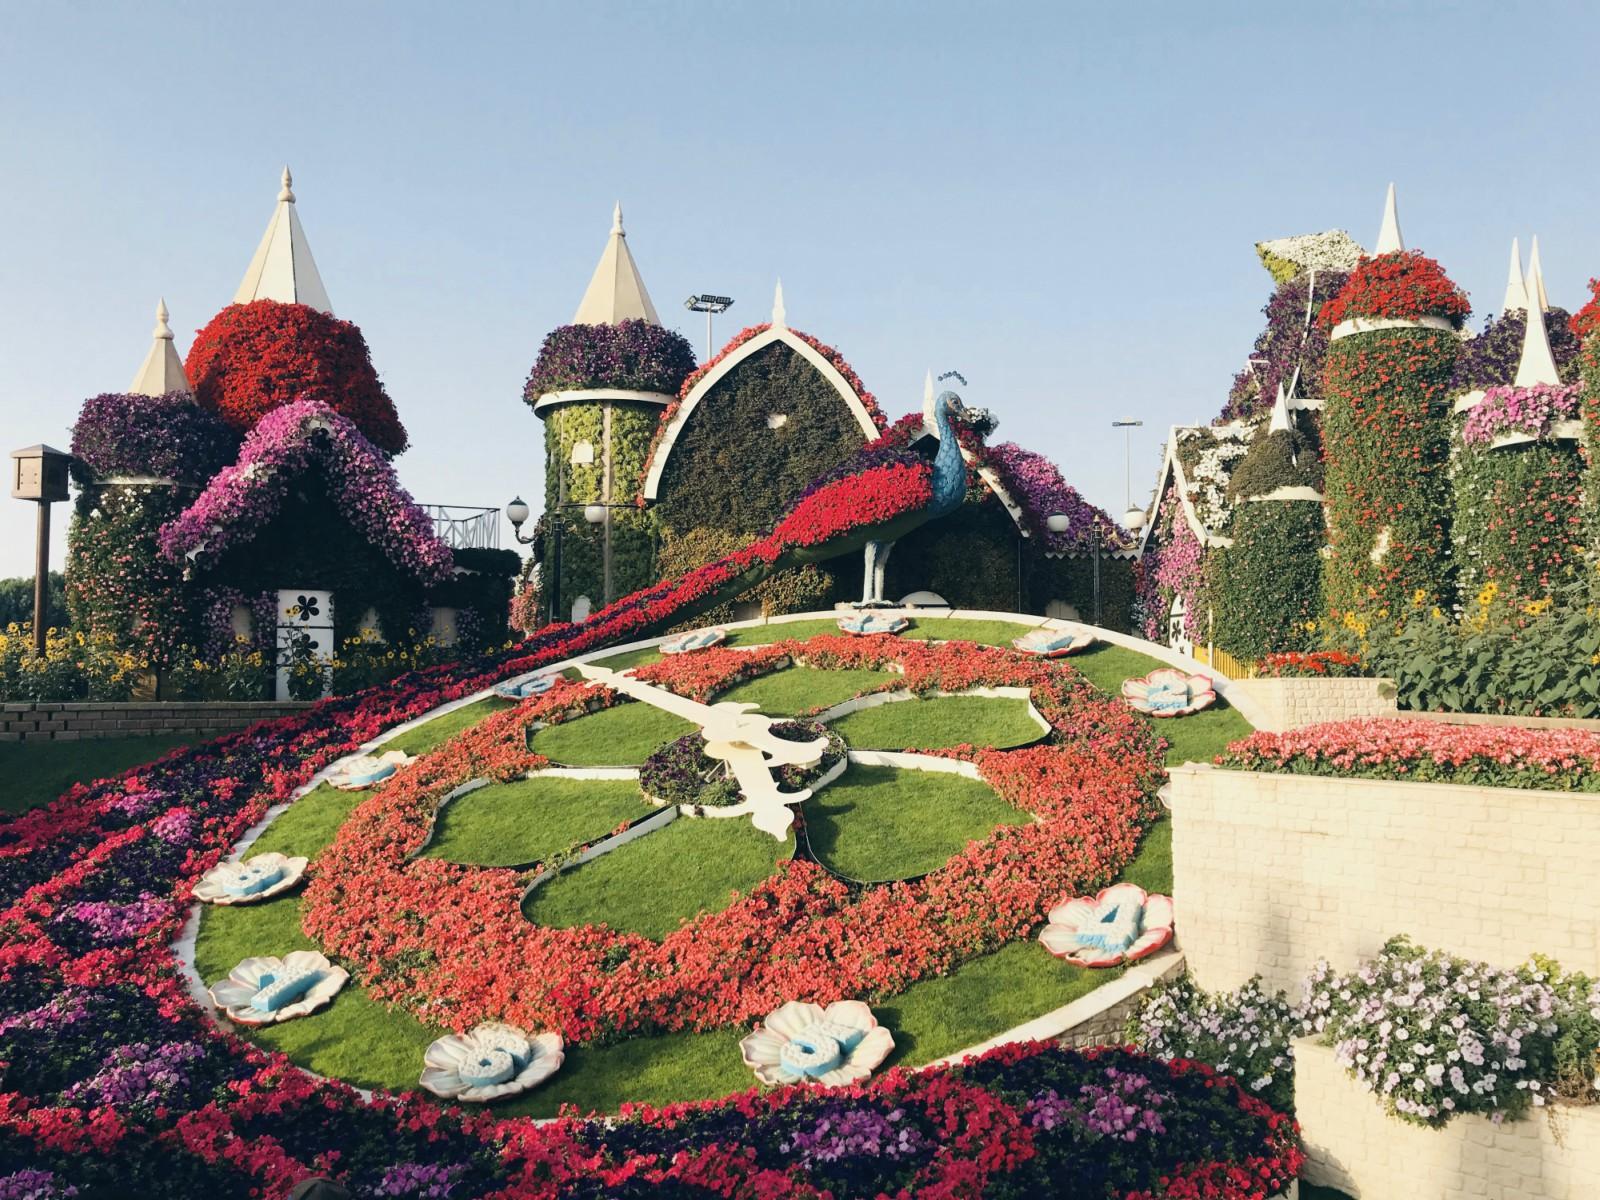 Dovolenka v Dubaji zaujímavosti Miracle Garden